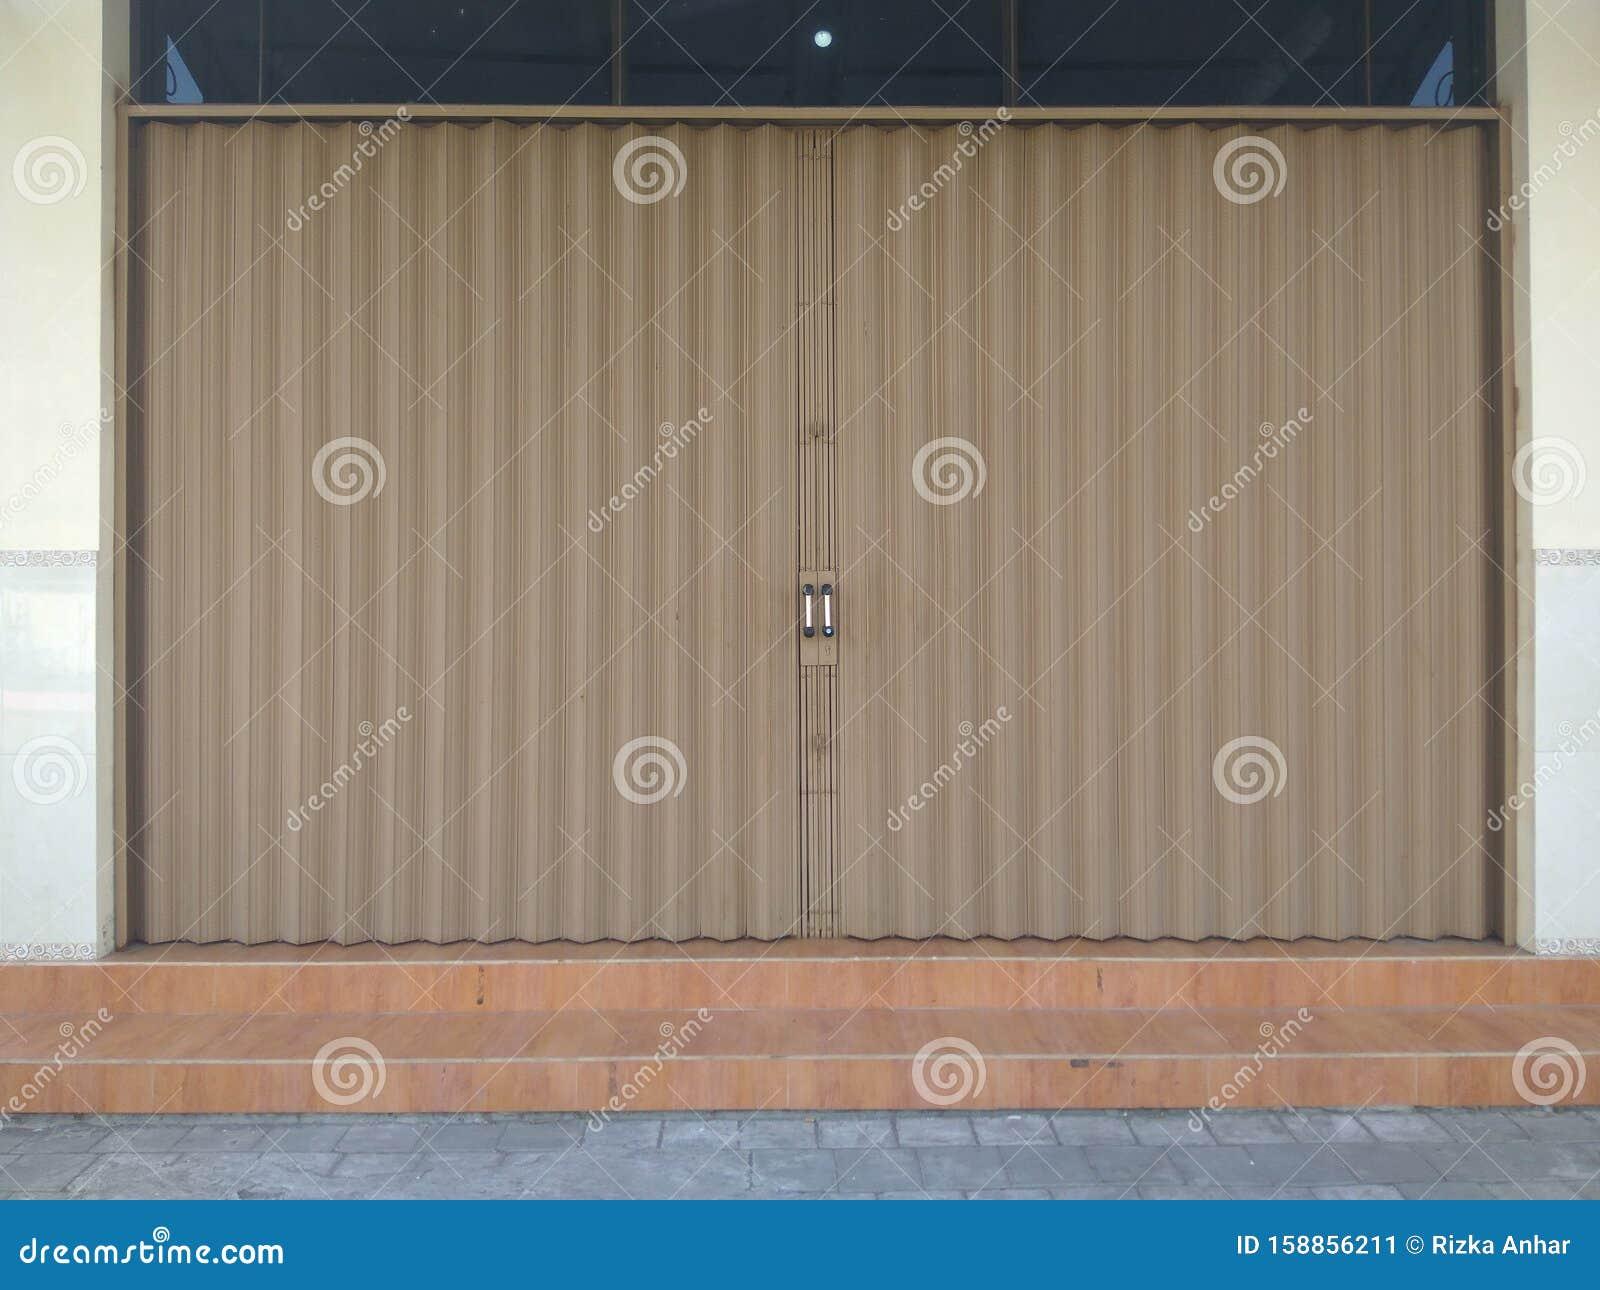 Rolling Door Folding Gate For Garage Stock Image Image Of Garage Consisting 158856211